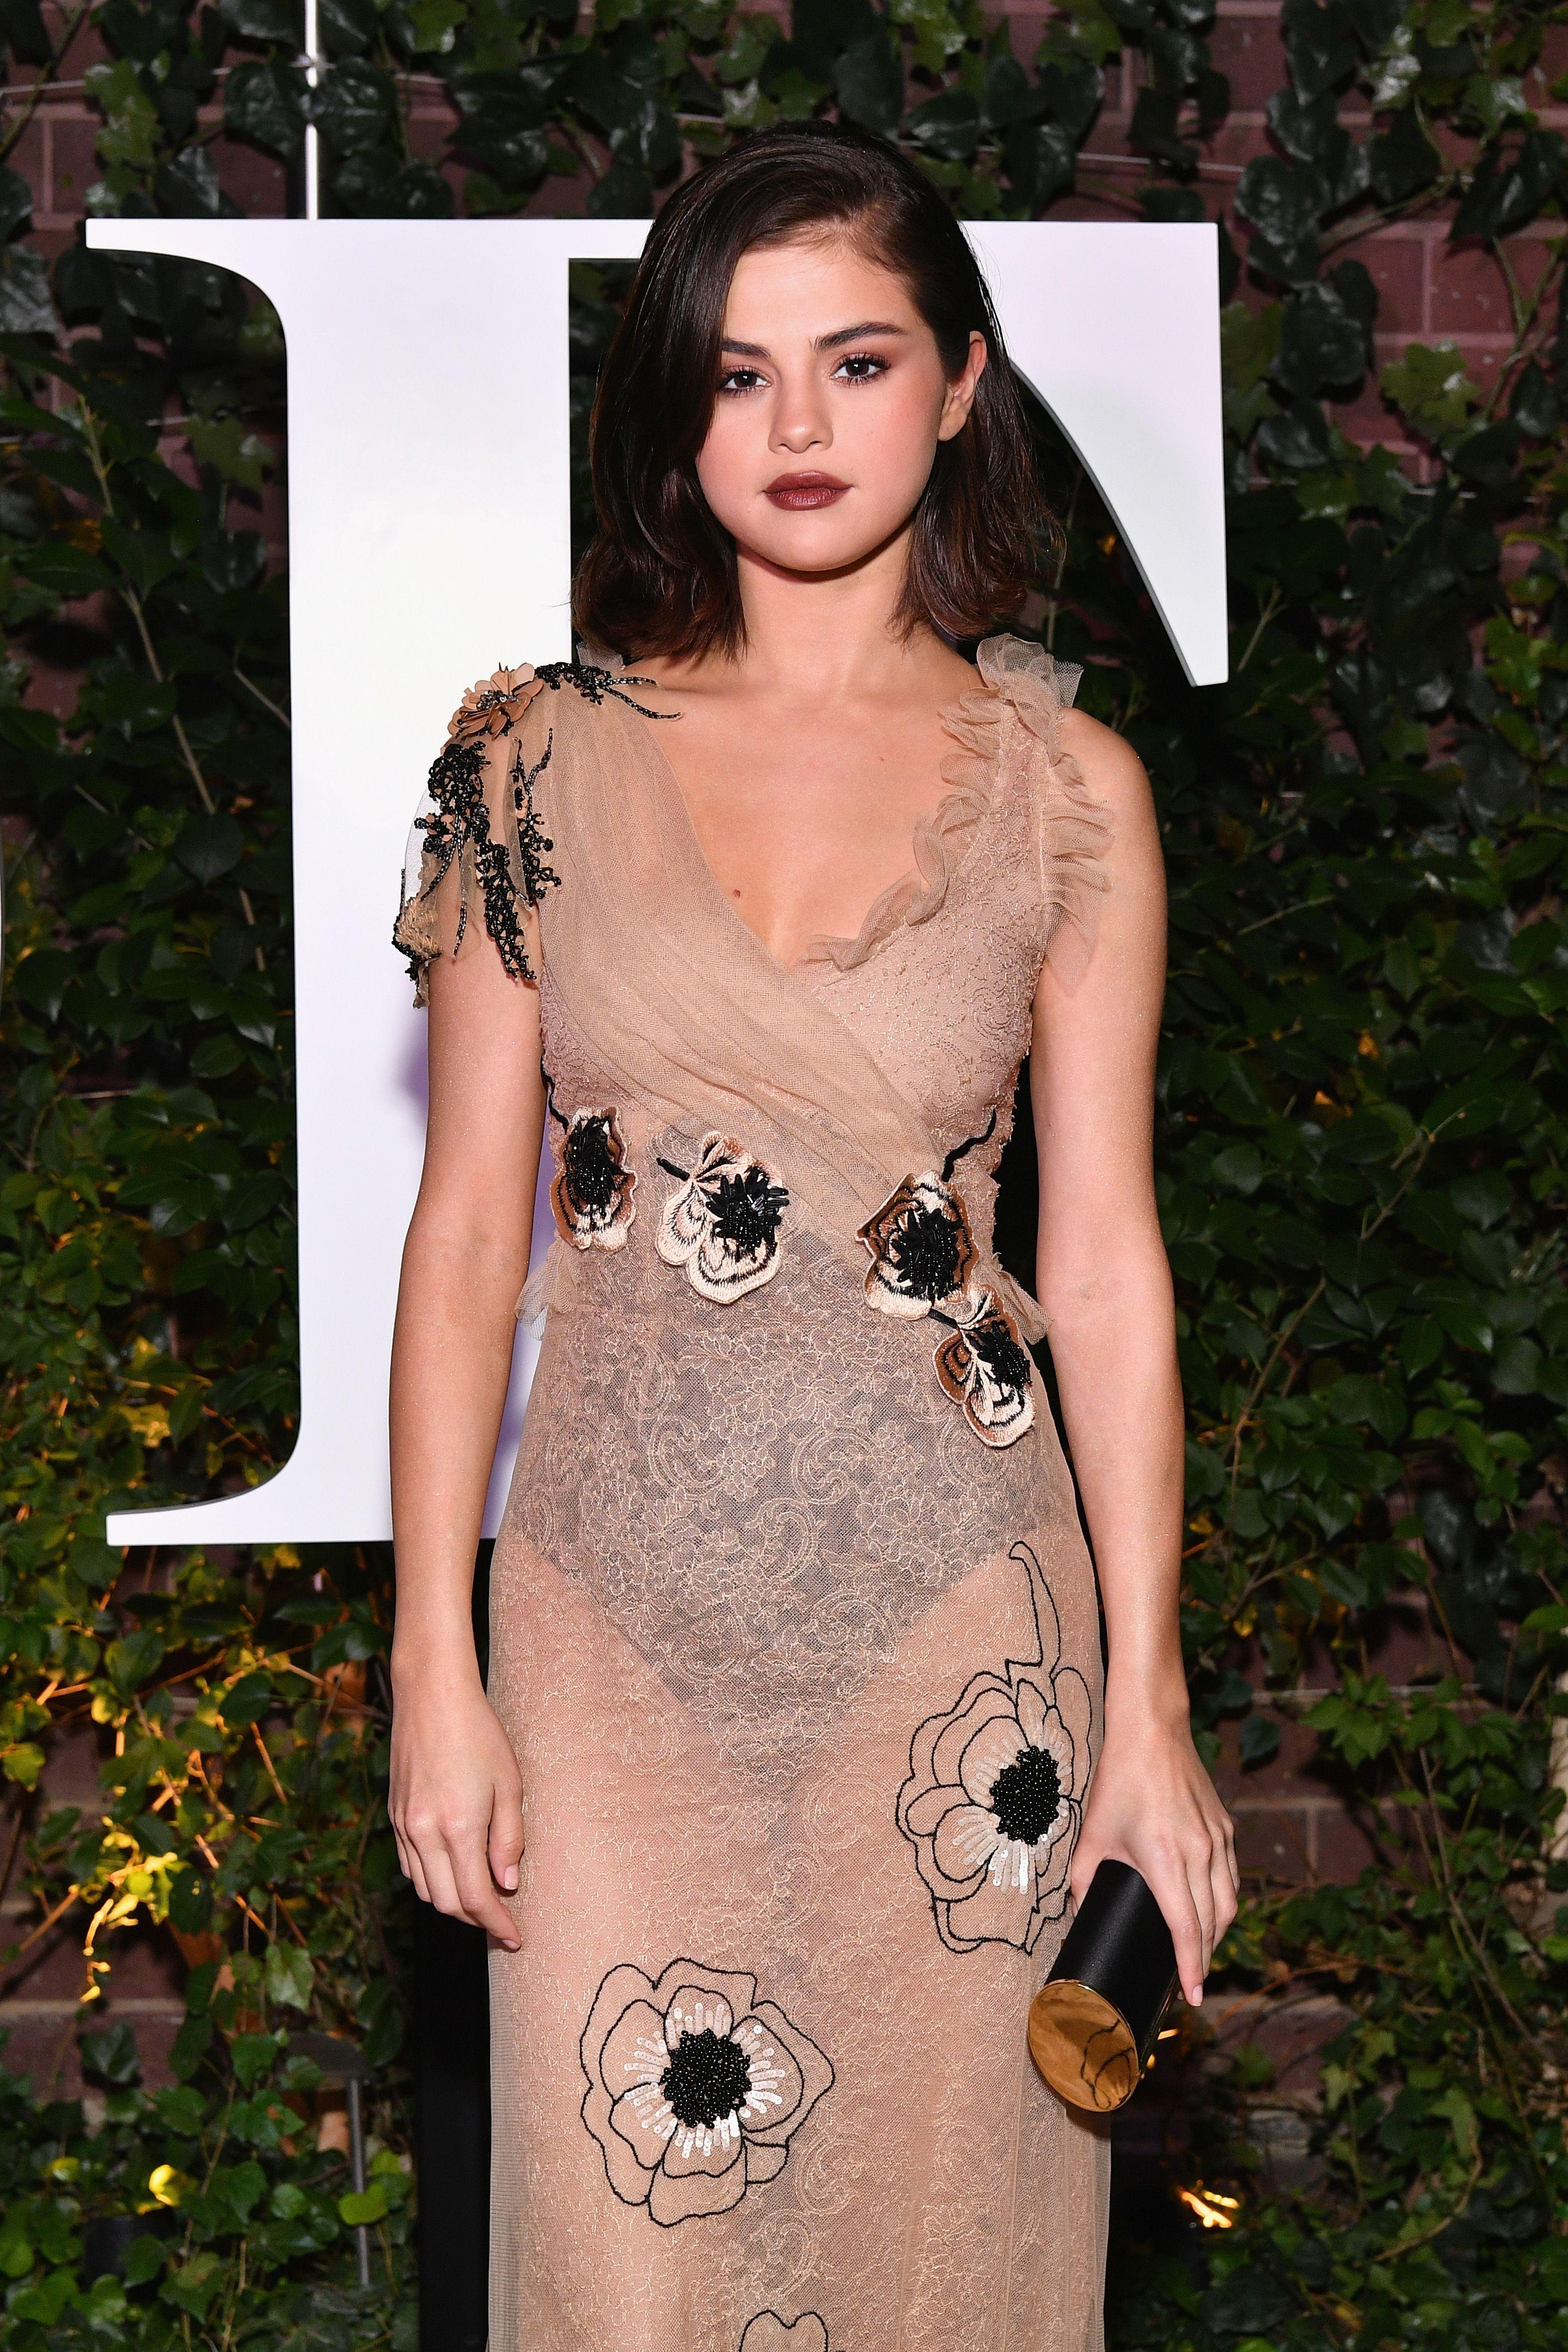 102f8bc000 Selena Gomez - The Business of Fashion 500 Gala